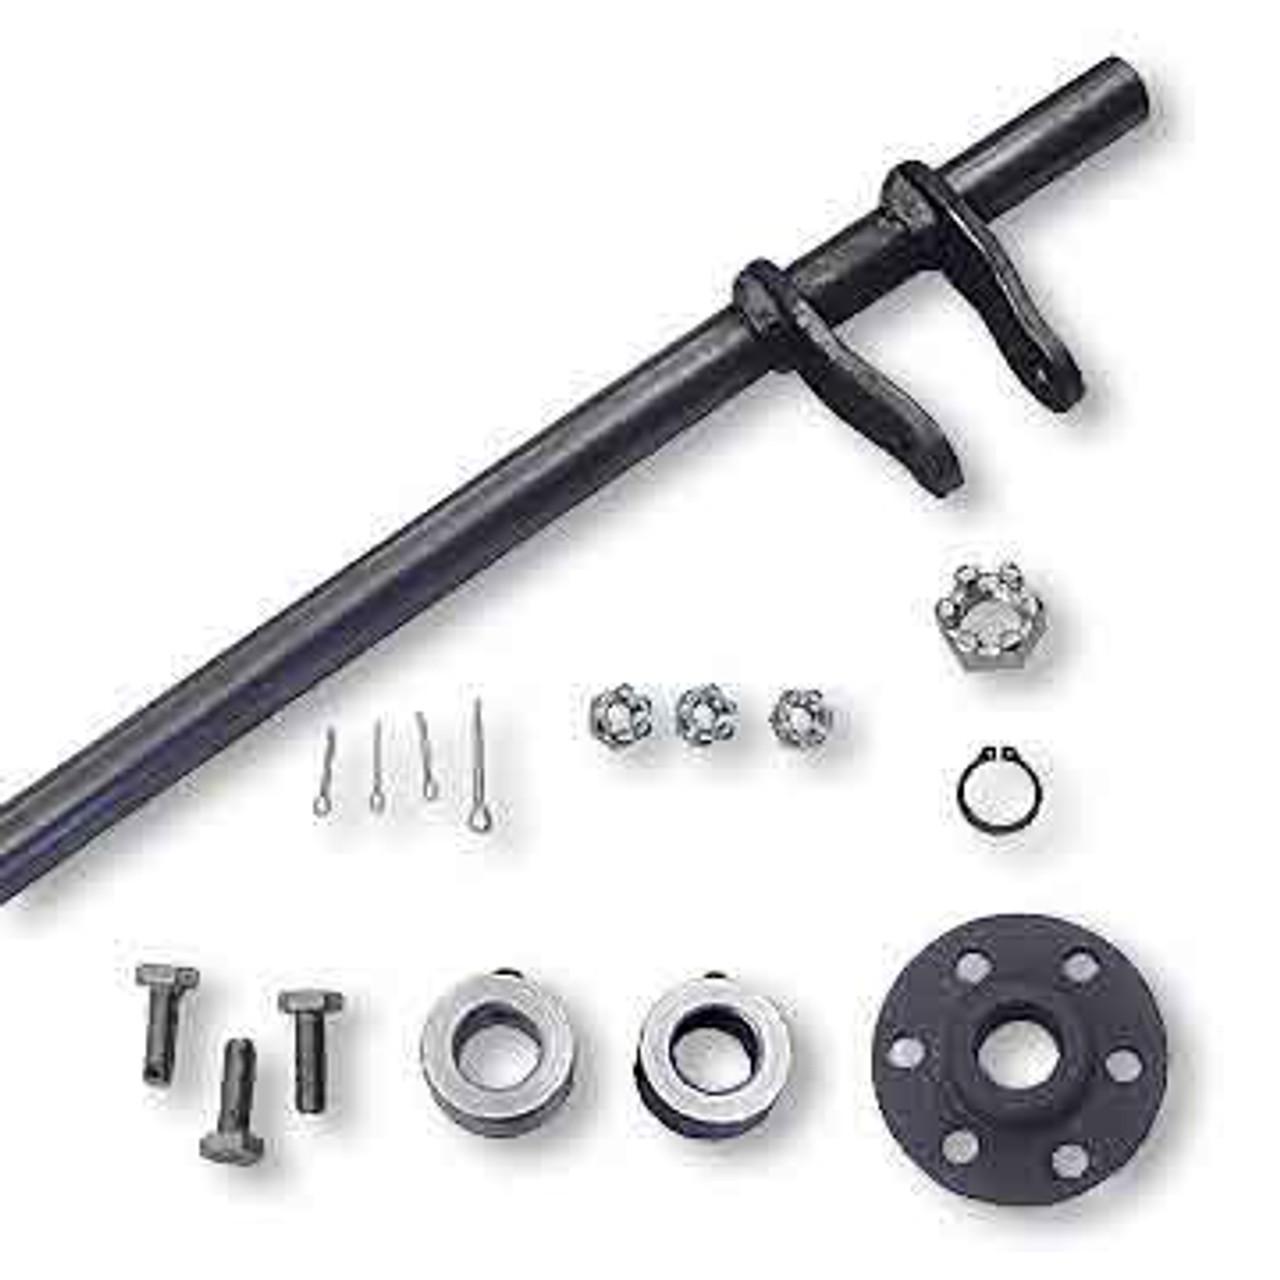 "Steering Shaft, 5/8"" OD & Hub Kit, Welded Pitman Arms, 34"" Length"